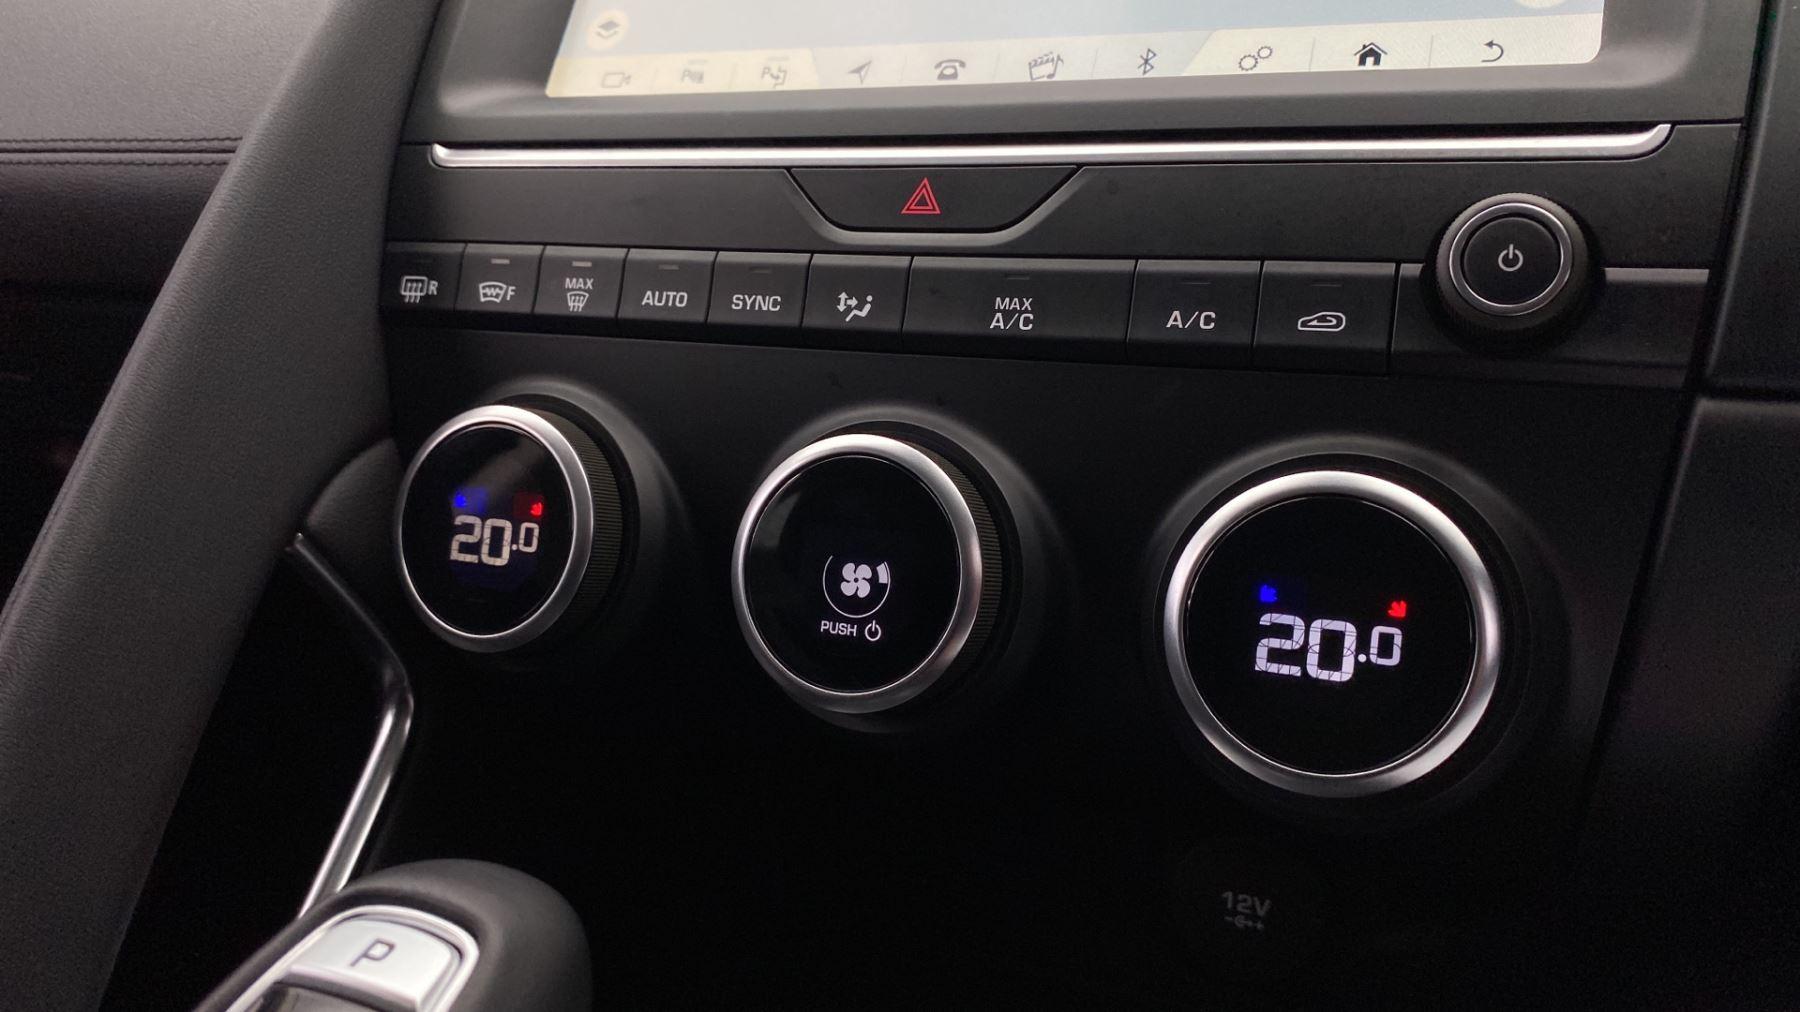 Jaguar E-PACE 2.0d SE AWD - Meridian Sound System - Powered Seats - Satellite Navigation image 23